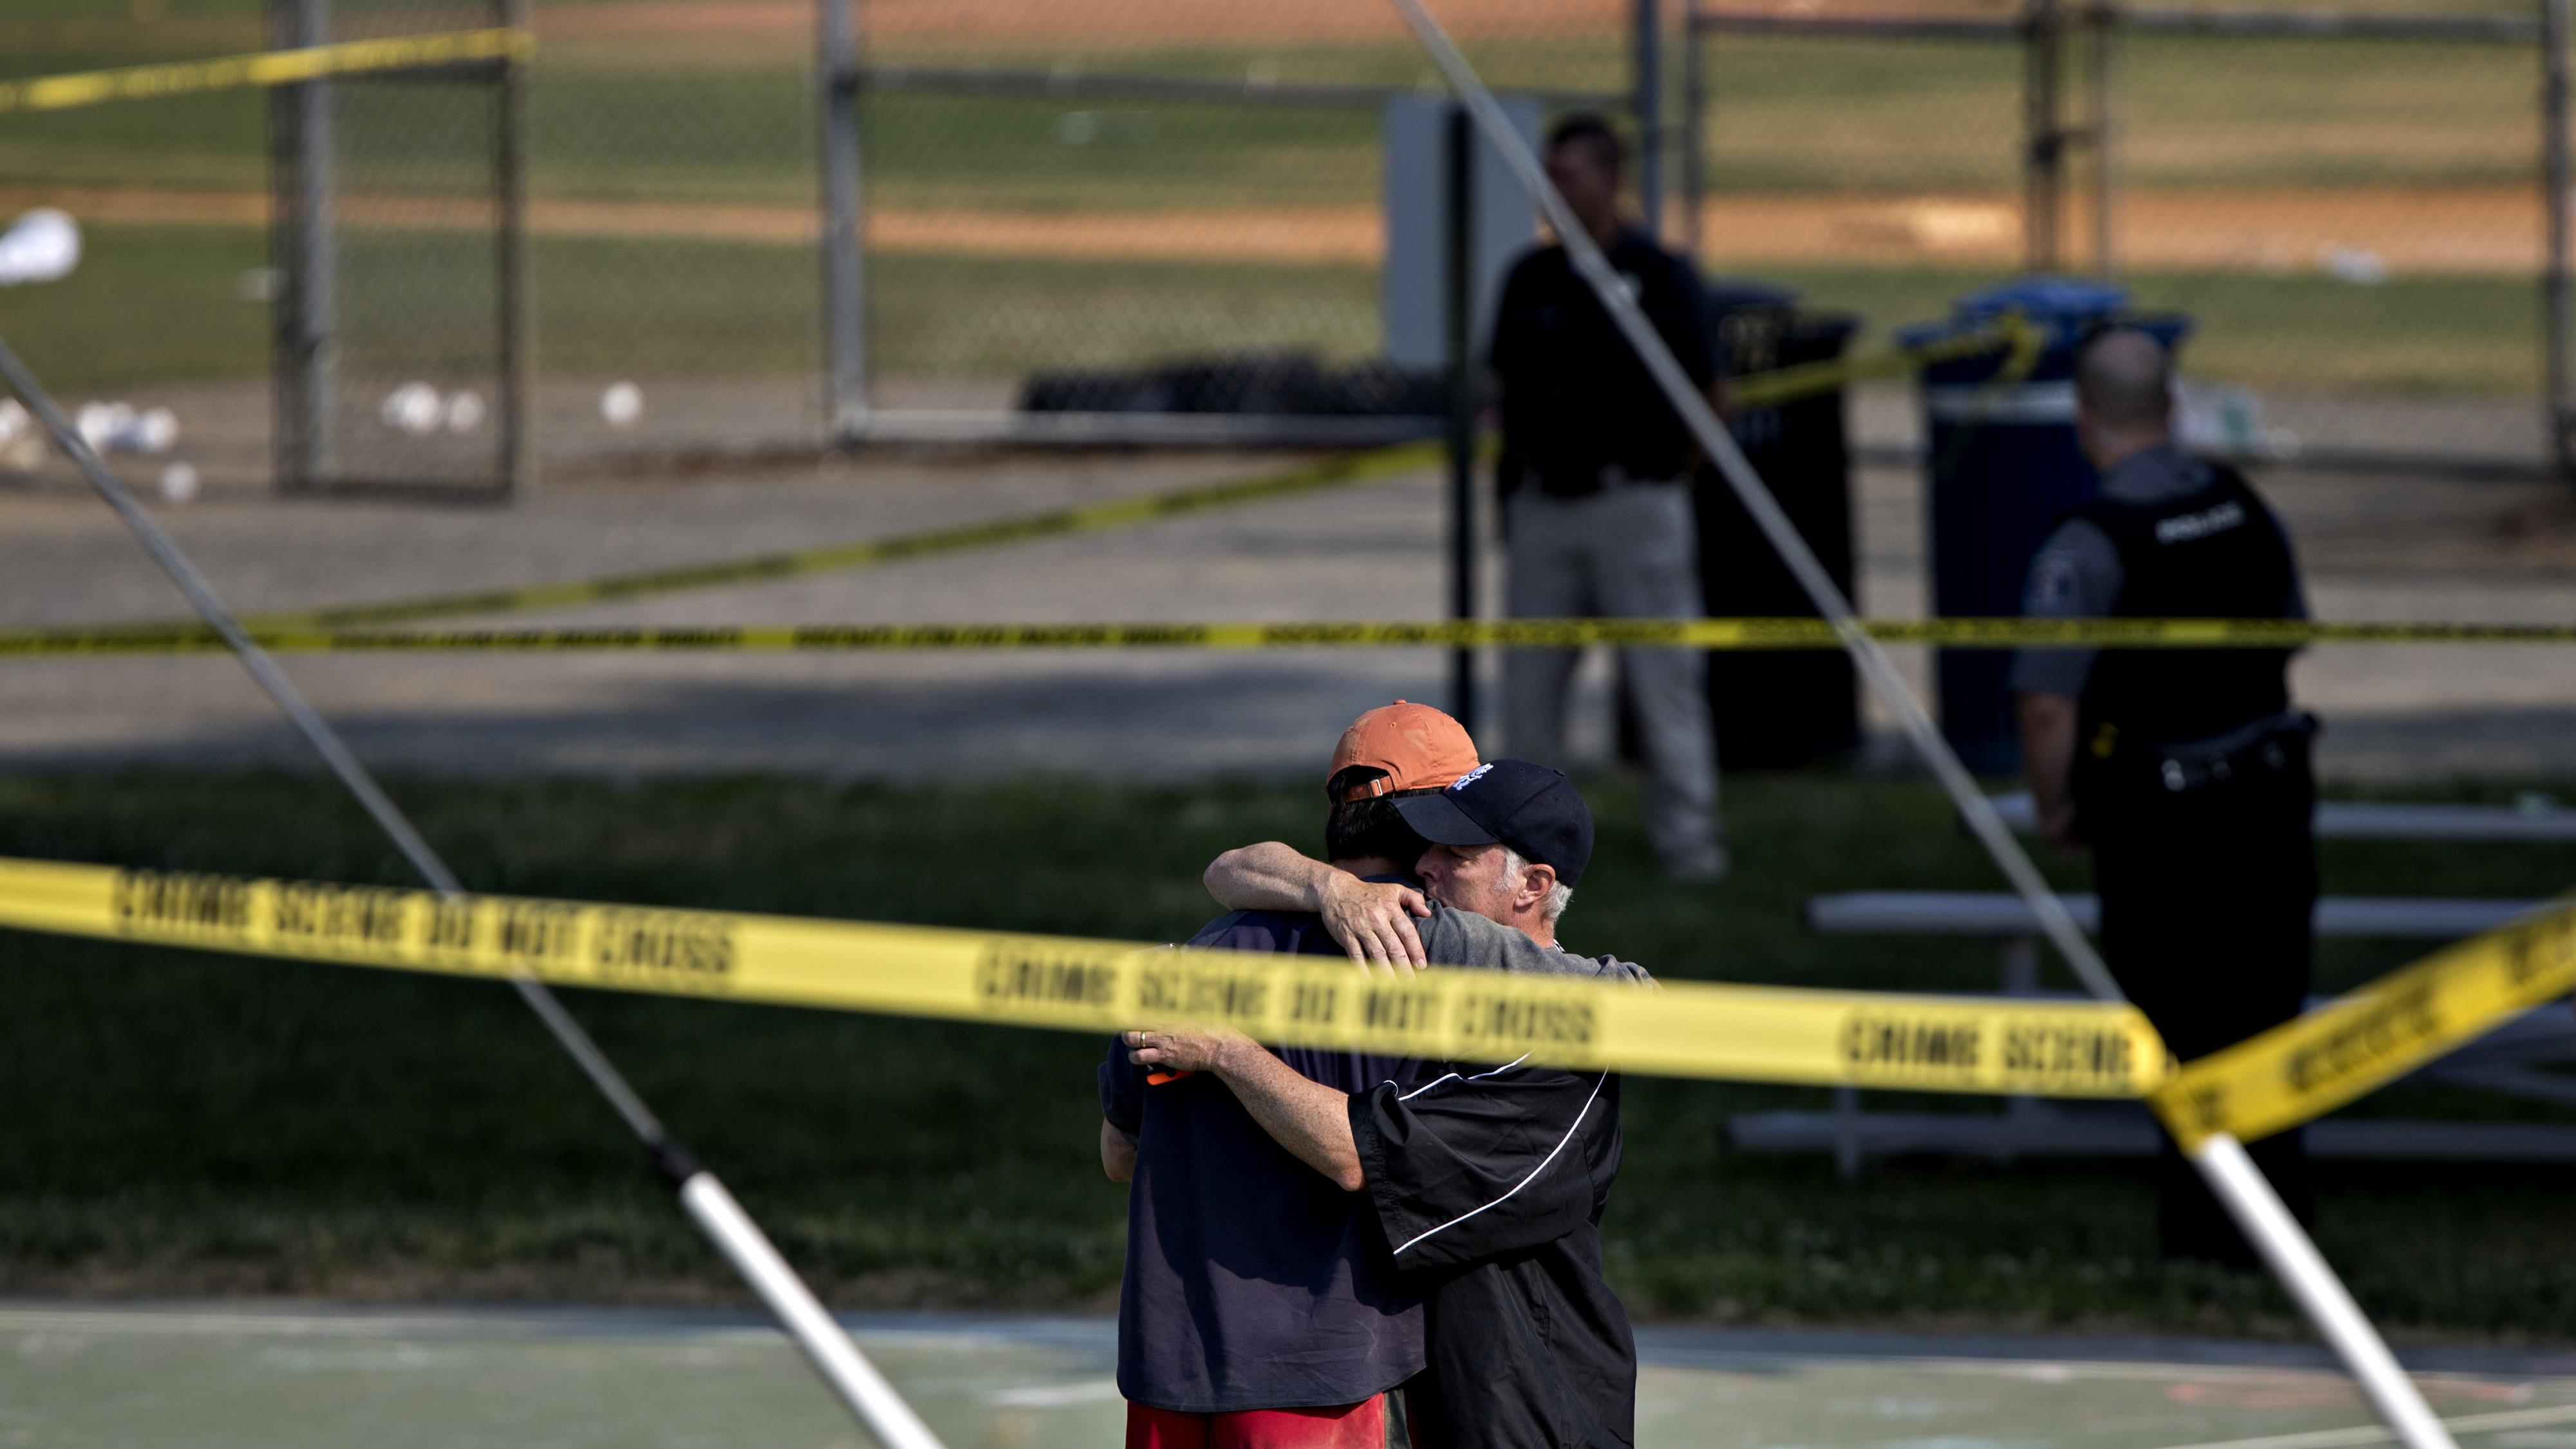 Gunman shoots top Republican leader at baseball practice; suspect arrested